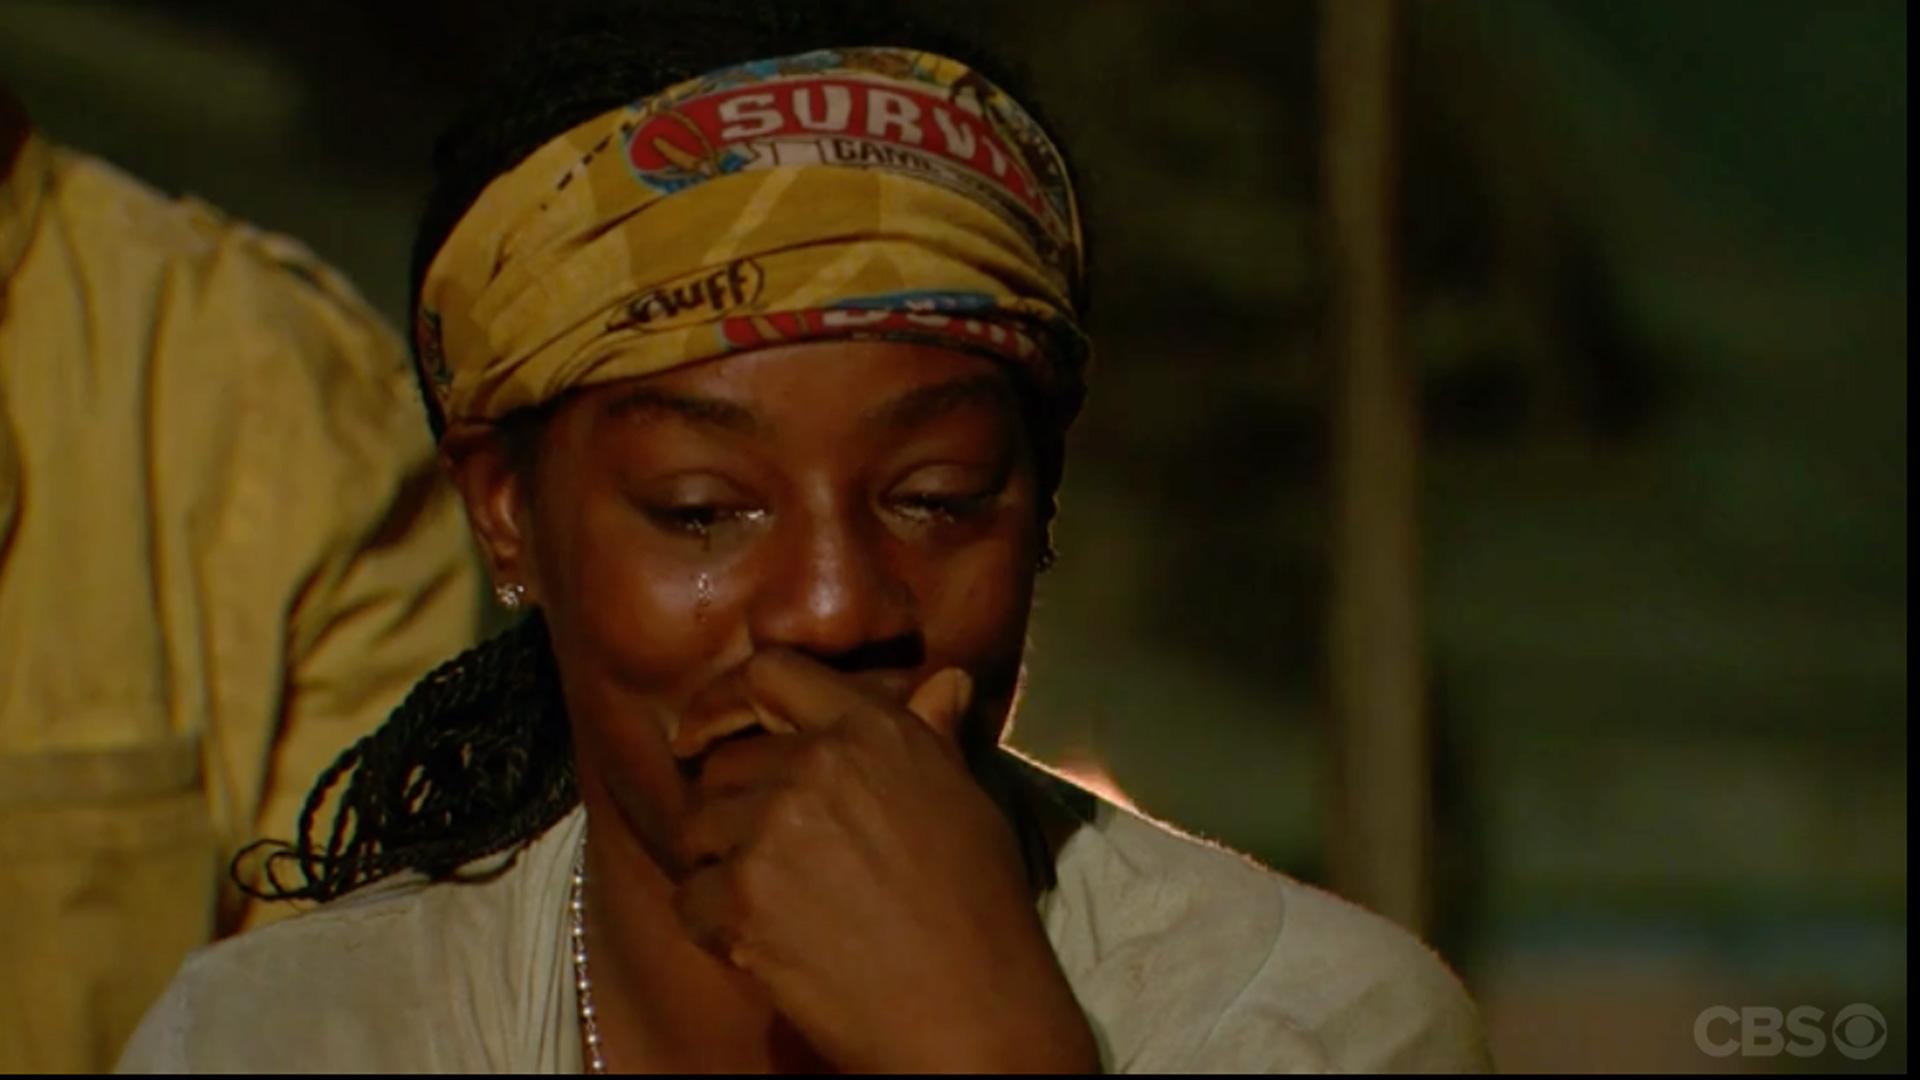 Cirie Fields from Survivor: Game Changers (Season 34)